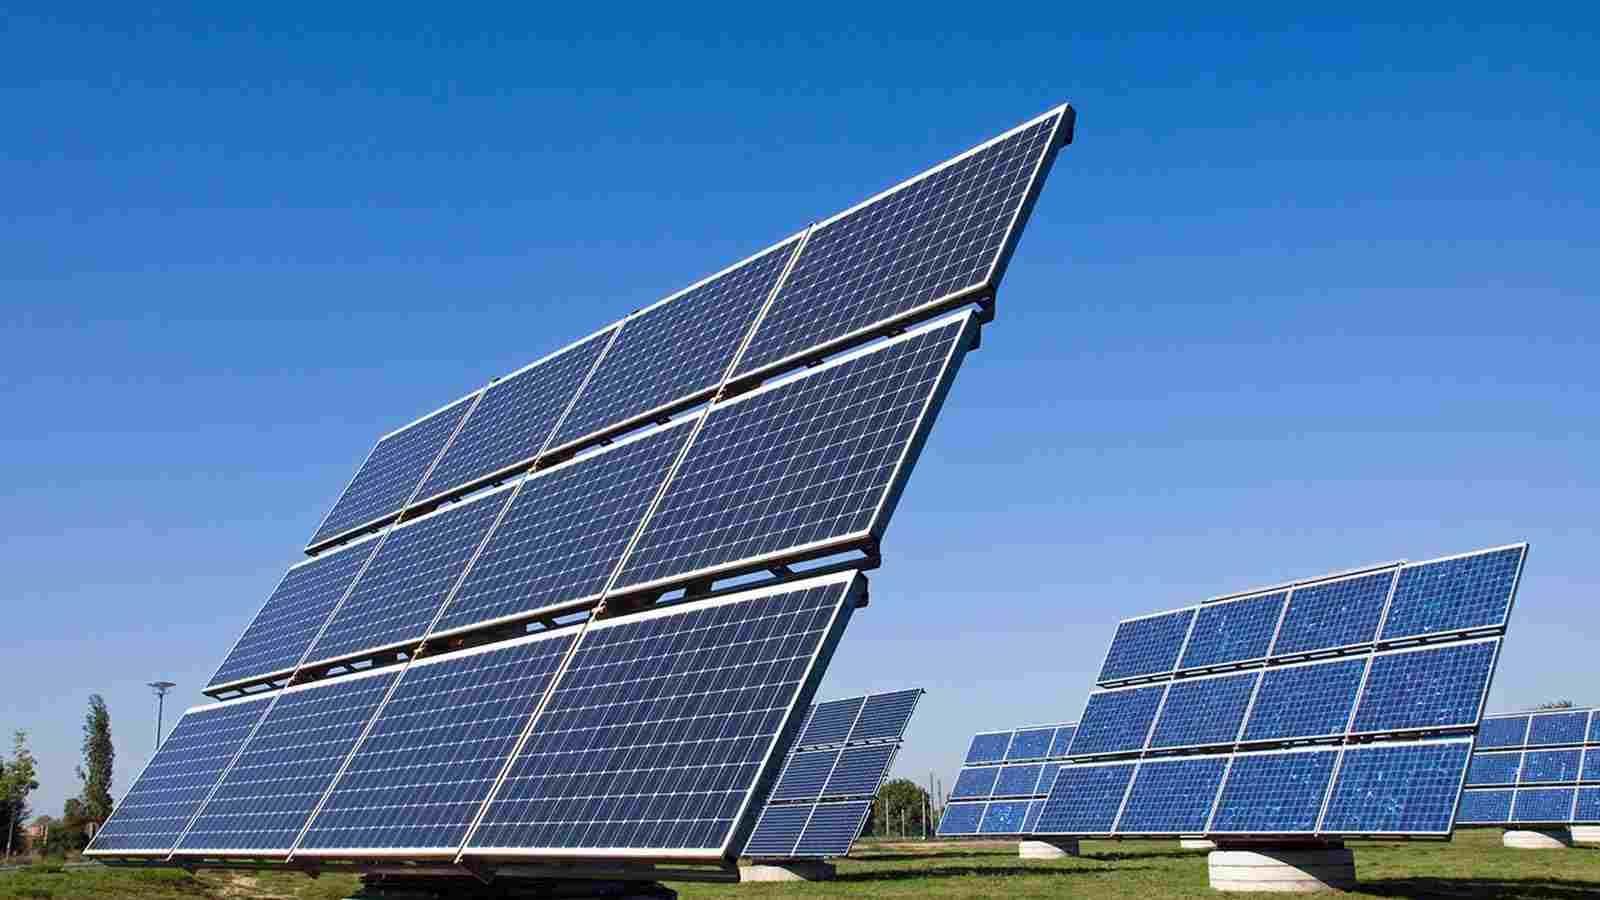 SmartBrains-PV-Photovoltaic-Power-System-Online-workshop-Training-Certification-Noida-Delhi-Mumbai-Chennai-Pune